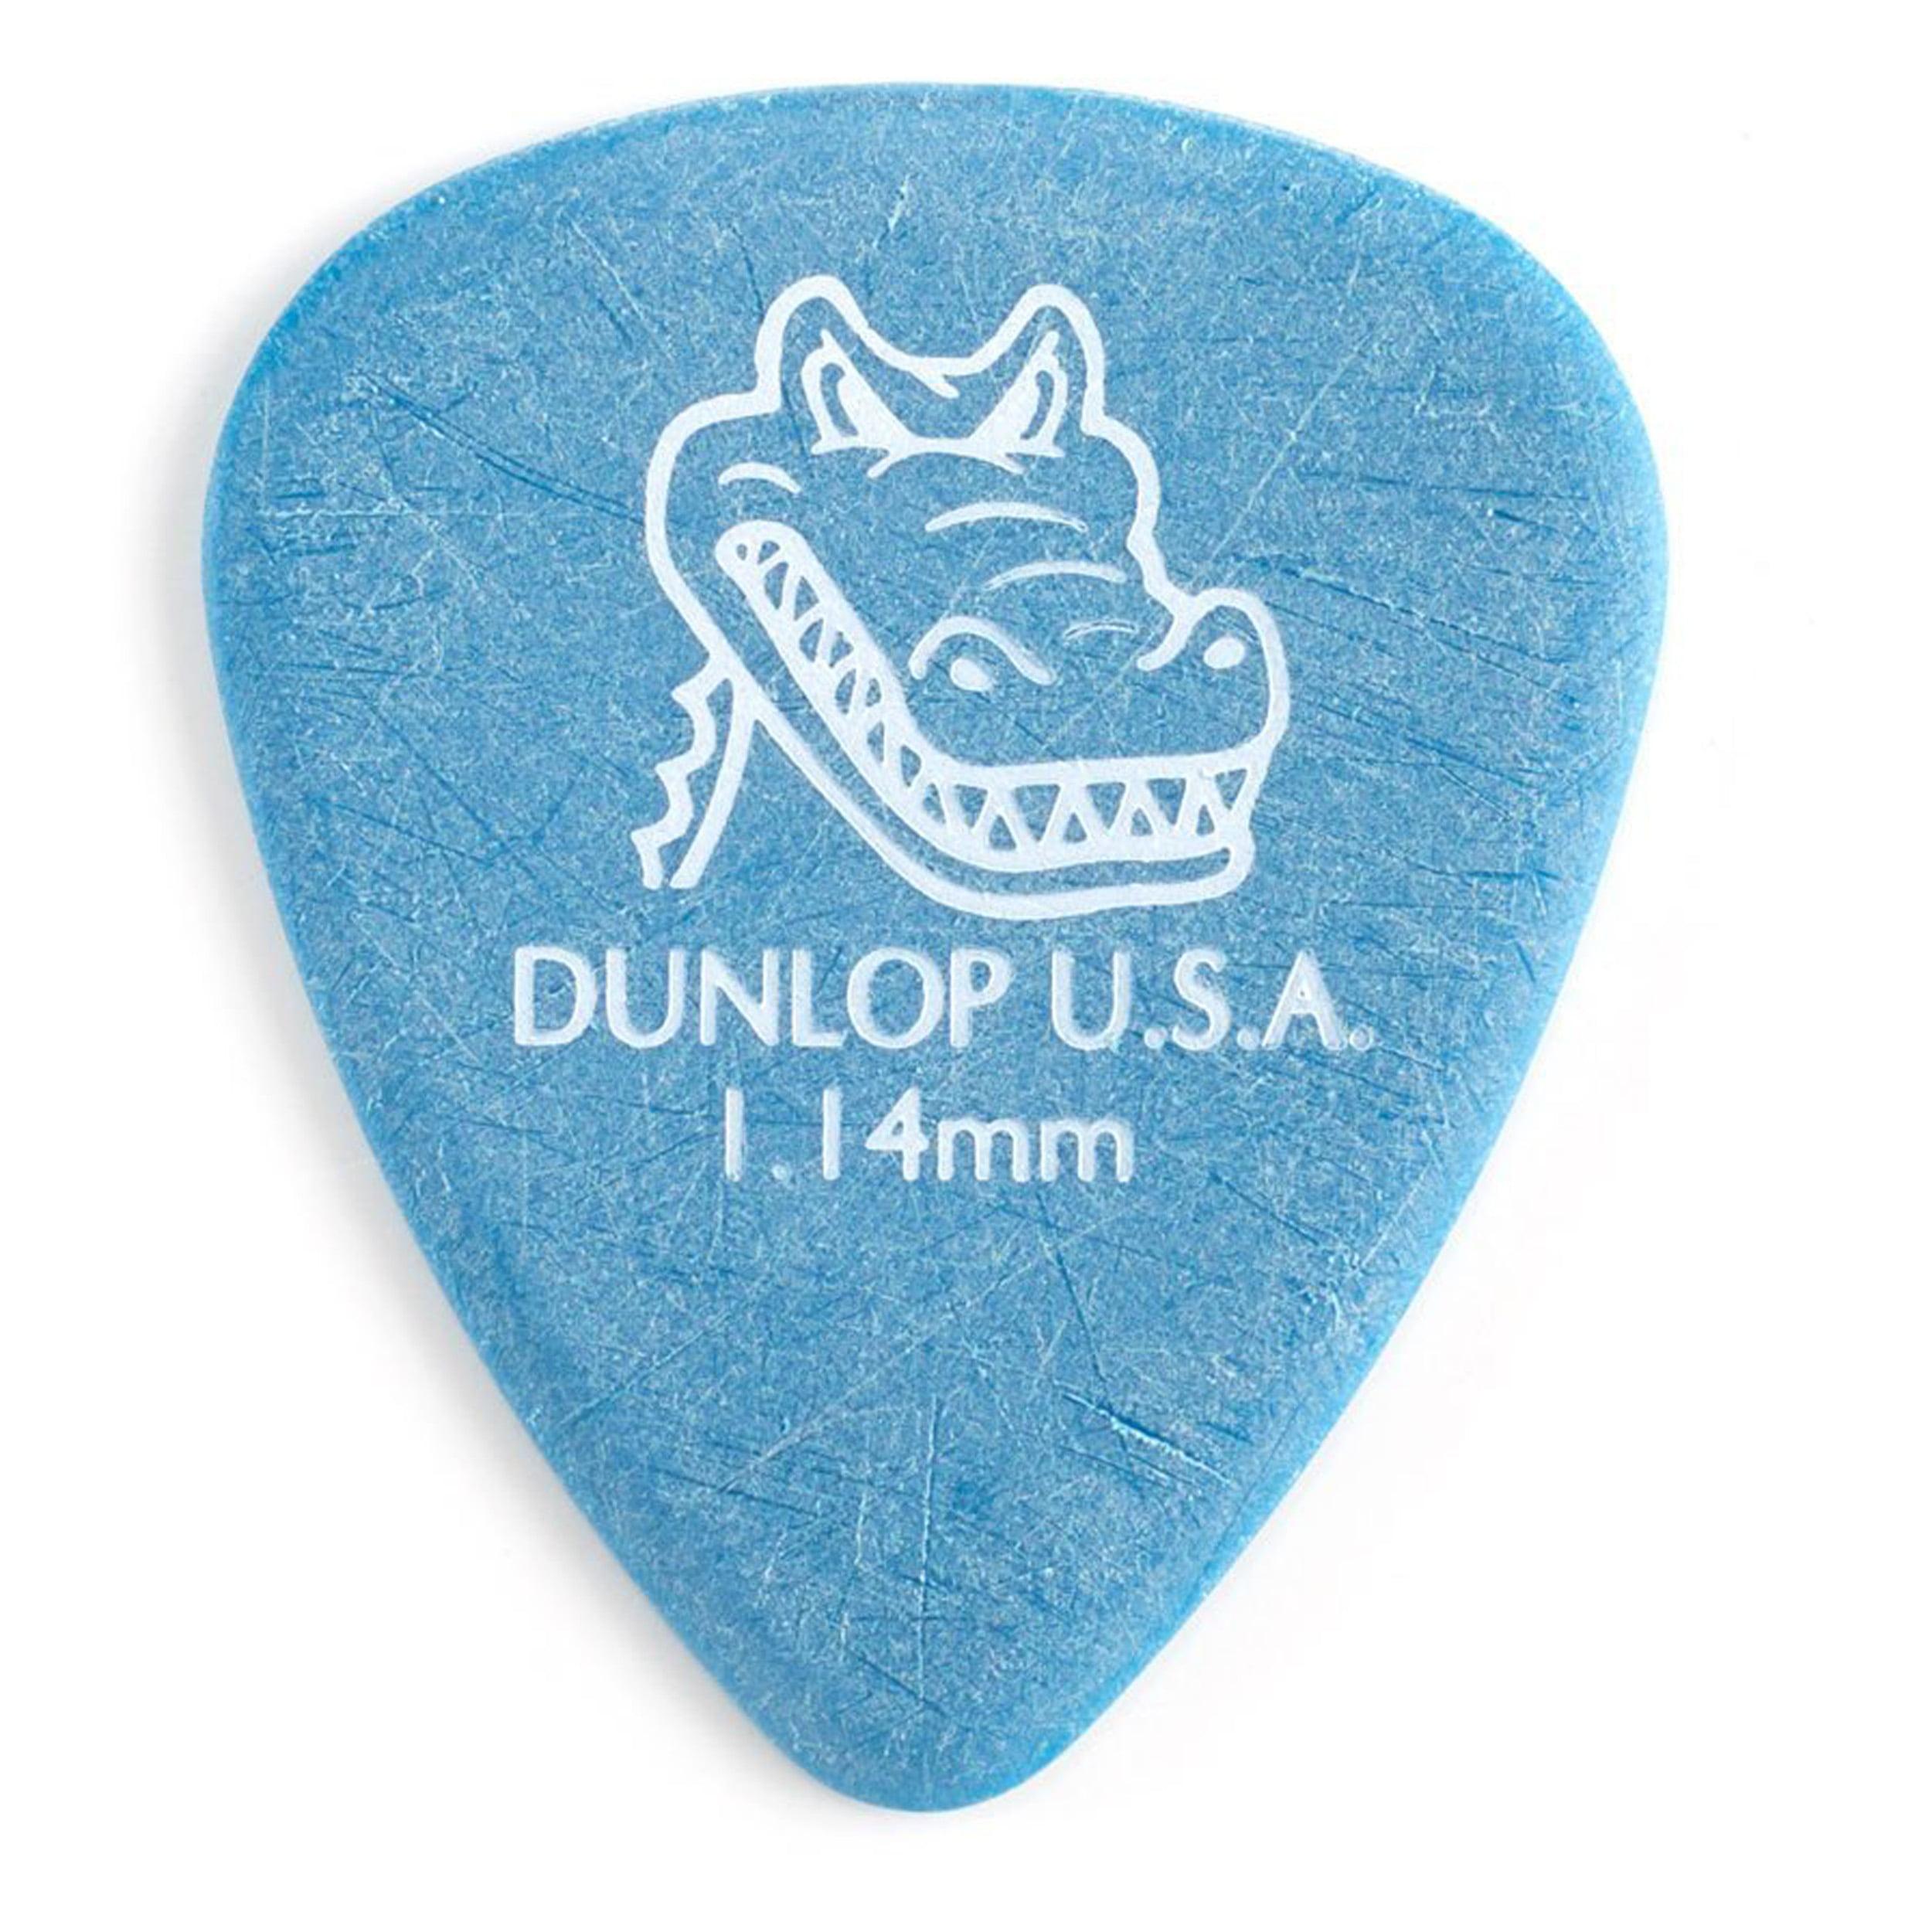 Dunlop Gator Standord Picks 12 Pack In Blue by Jim Dunlop